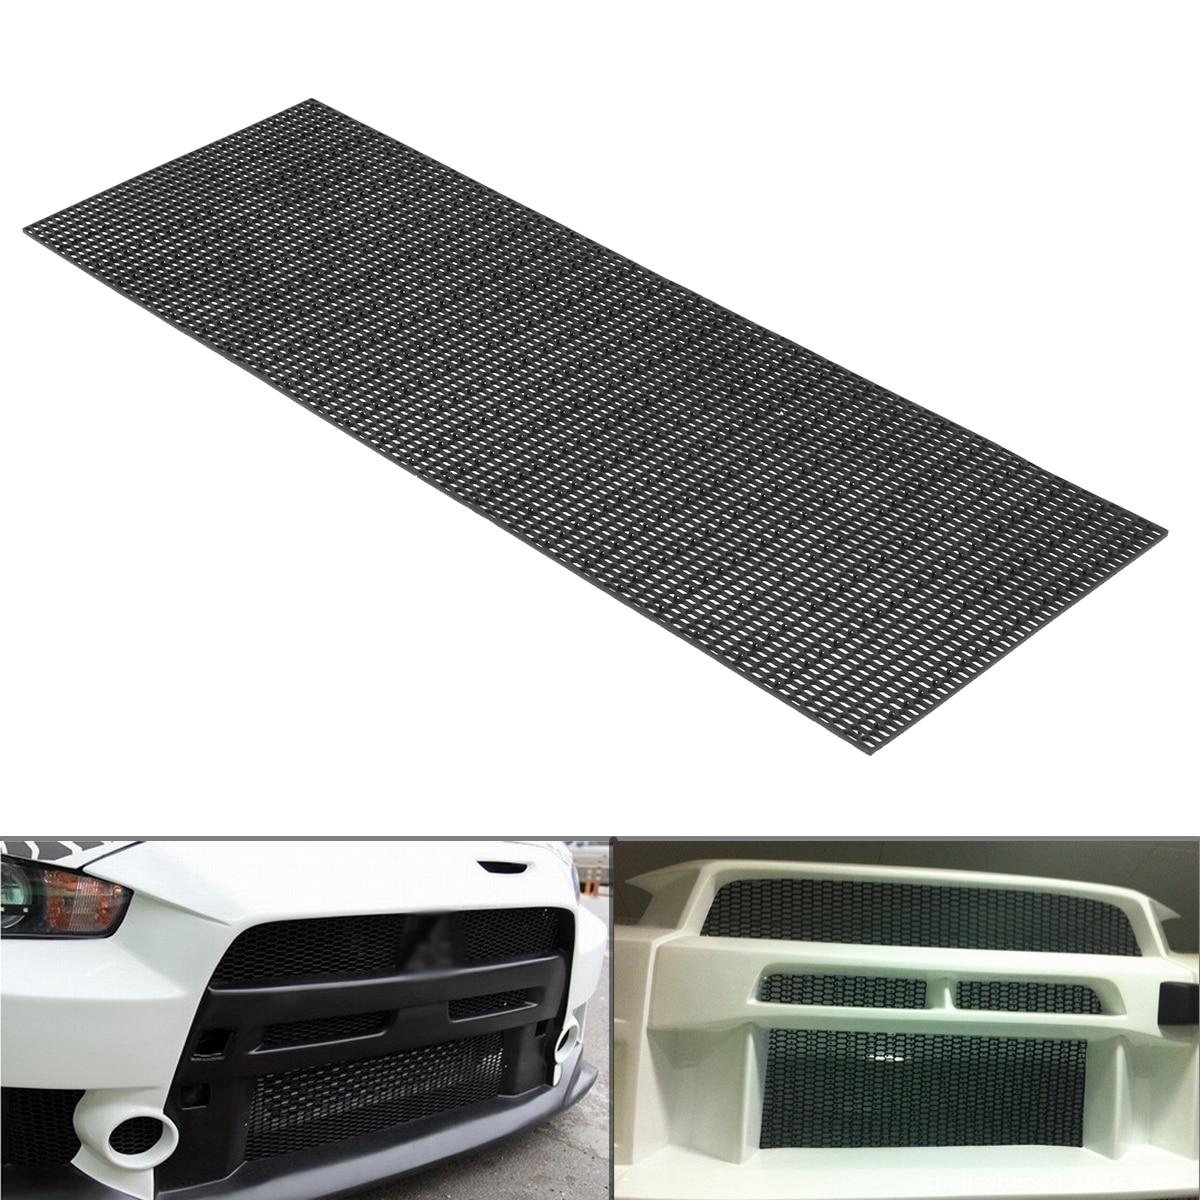 Universal Black Honeycomb ABS Plastic Vent Car Tuning Racing Grill Mesh 40x120cm auldey 88010 abs racing car kit